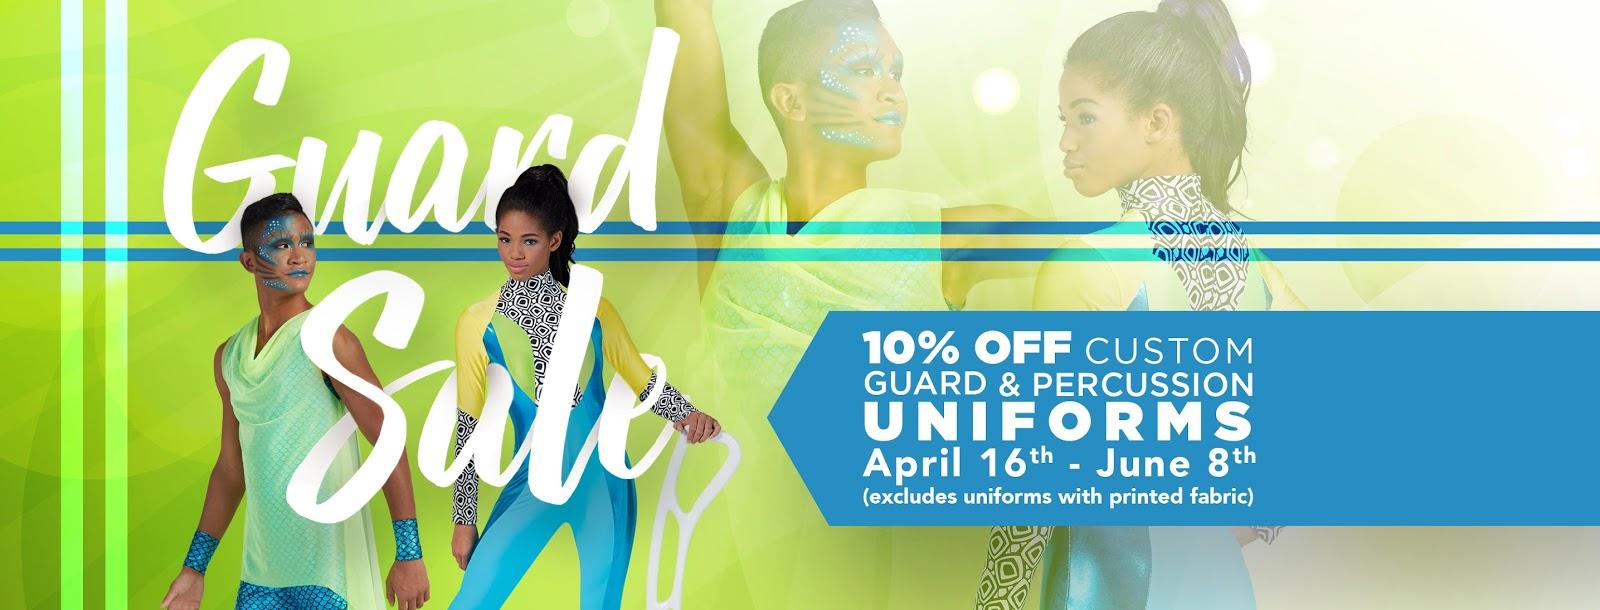 Spring Guard Sale